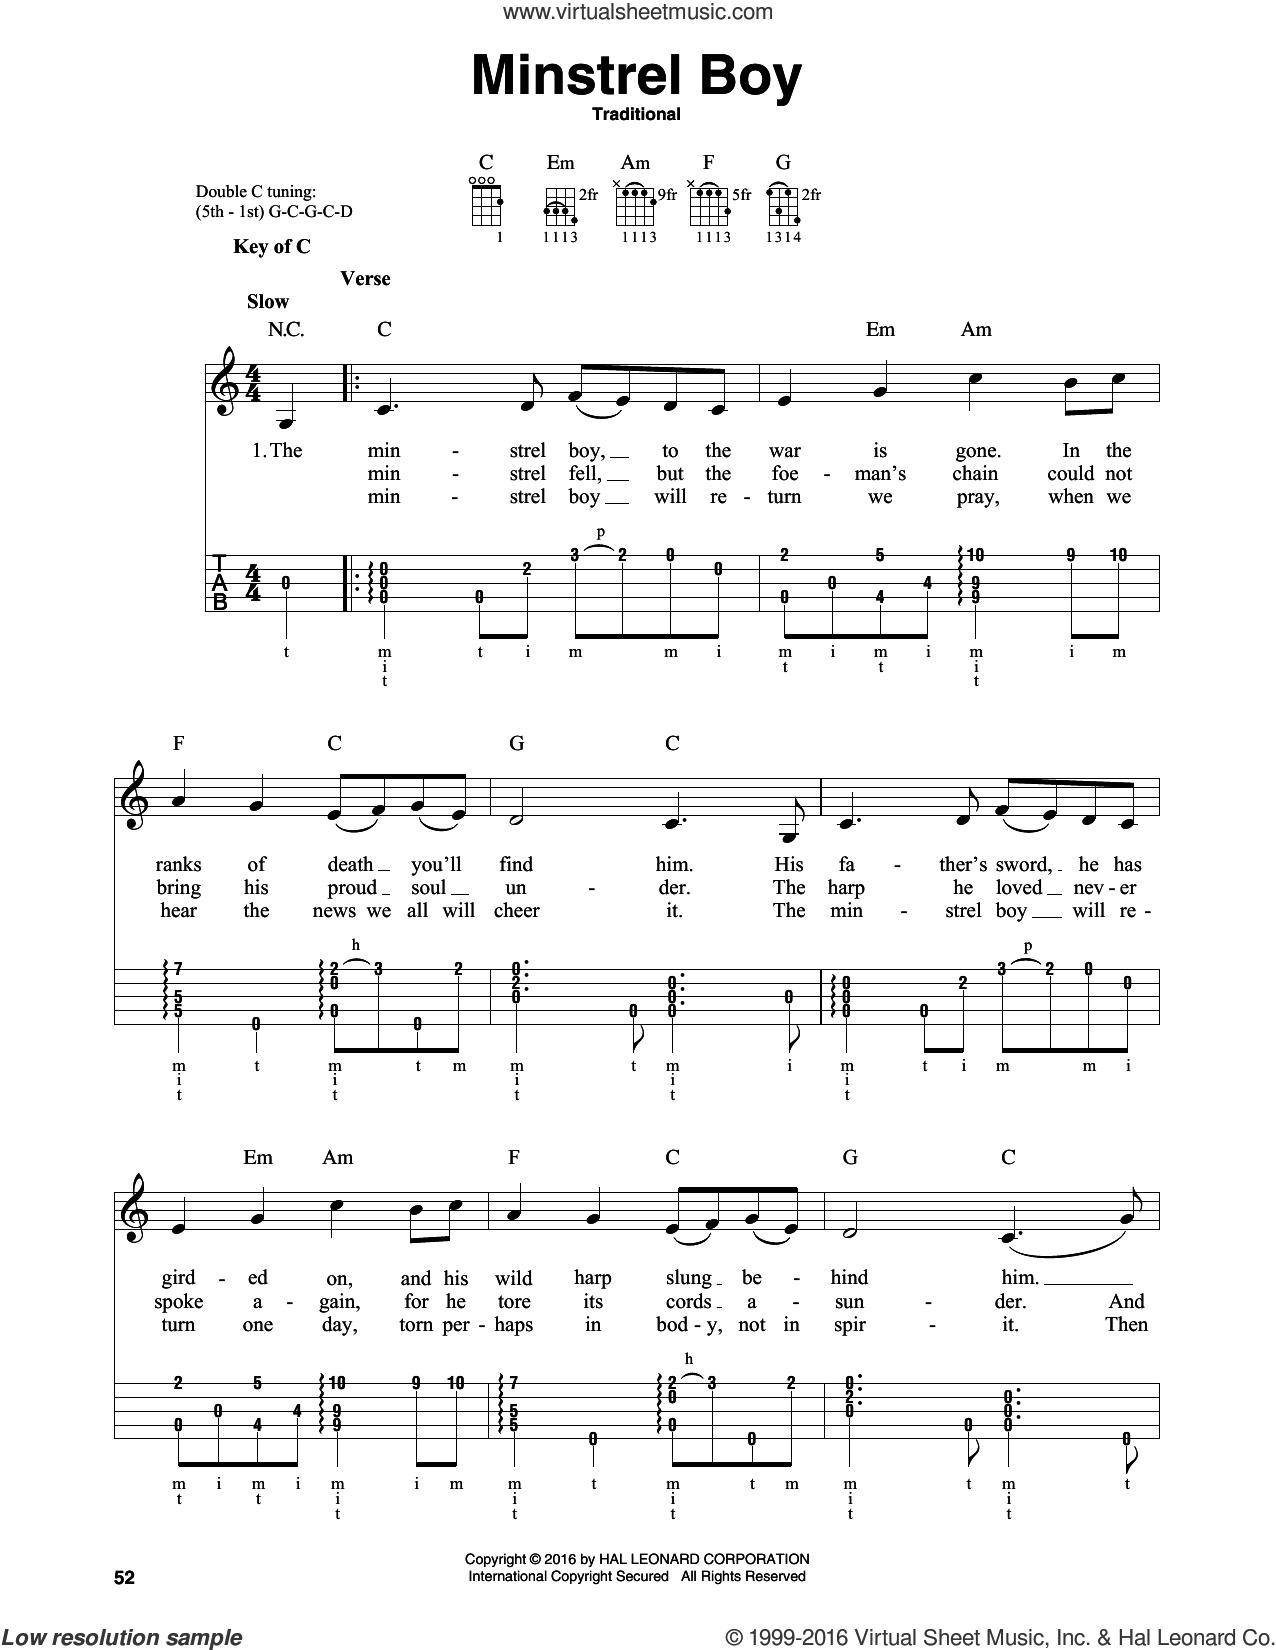 Minstrel Boy sheet music for banjo solo, intermediate skill level